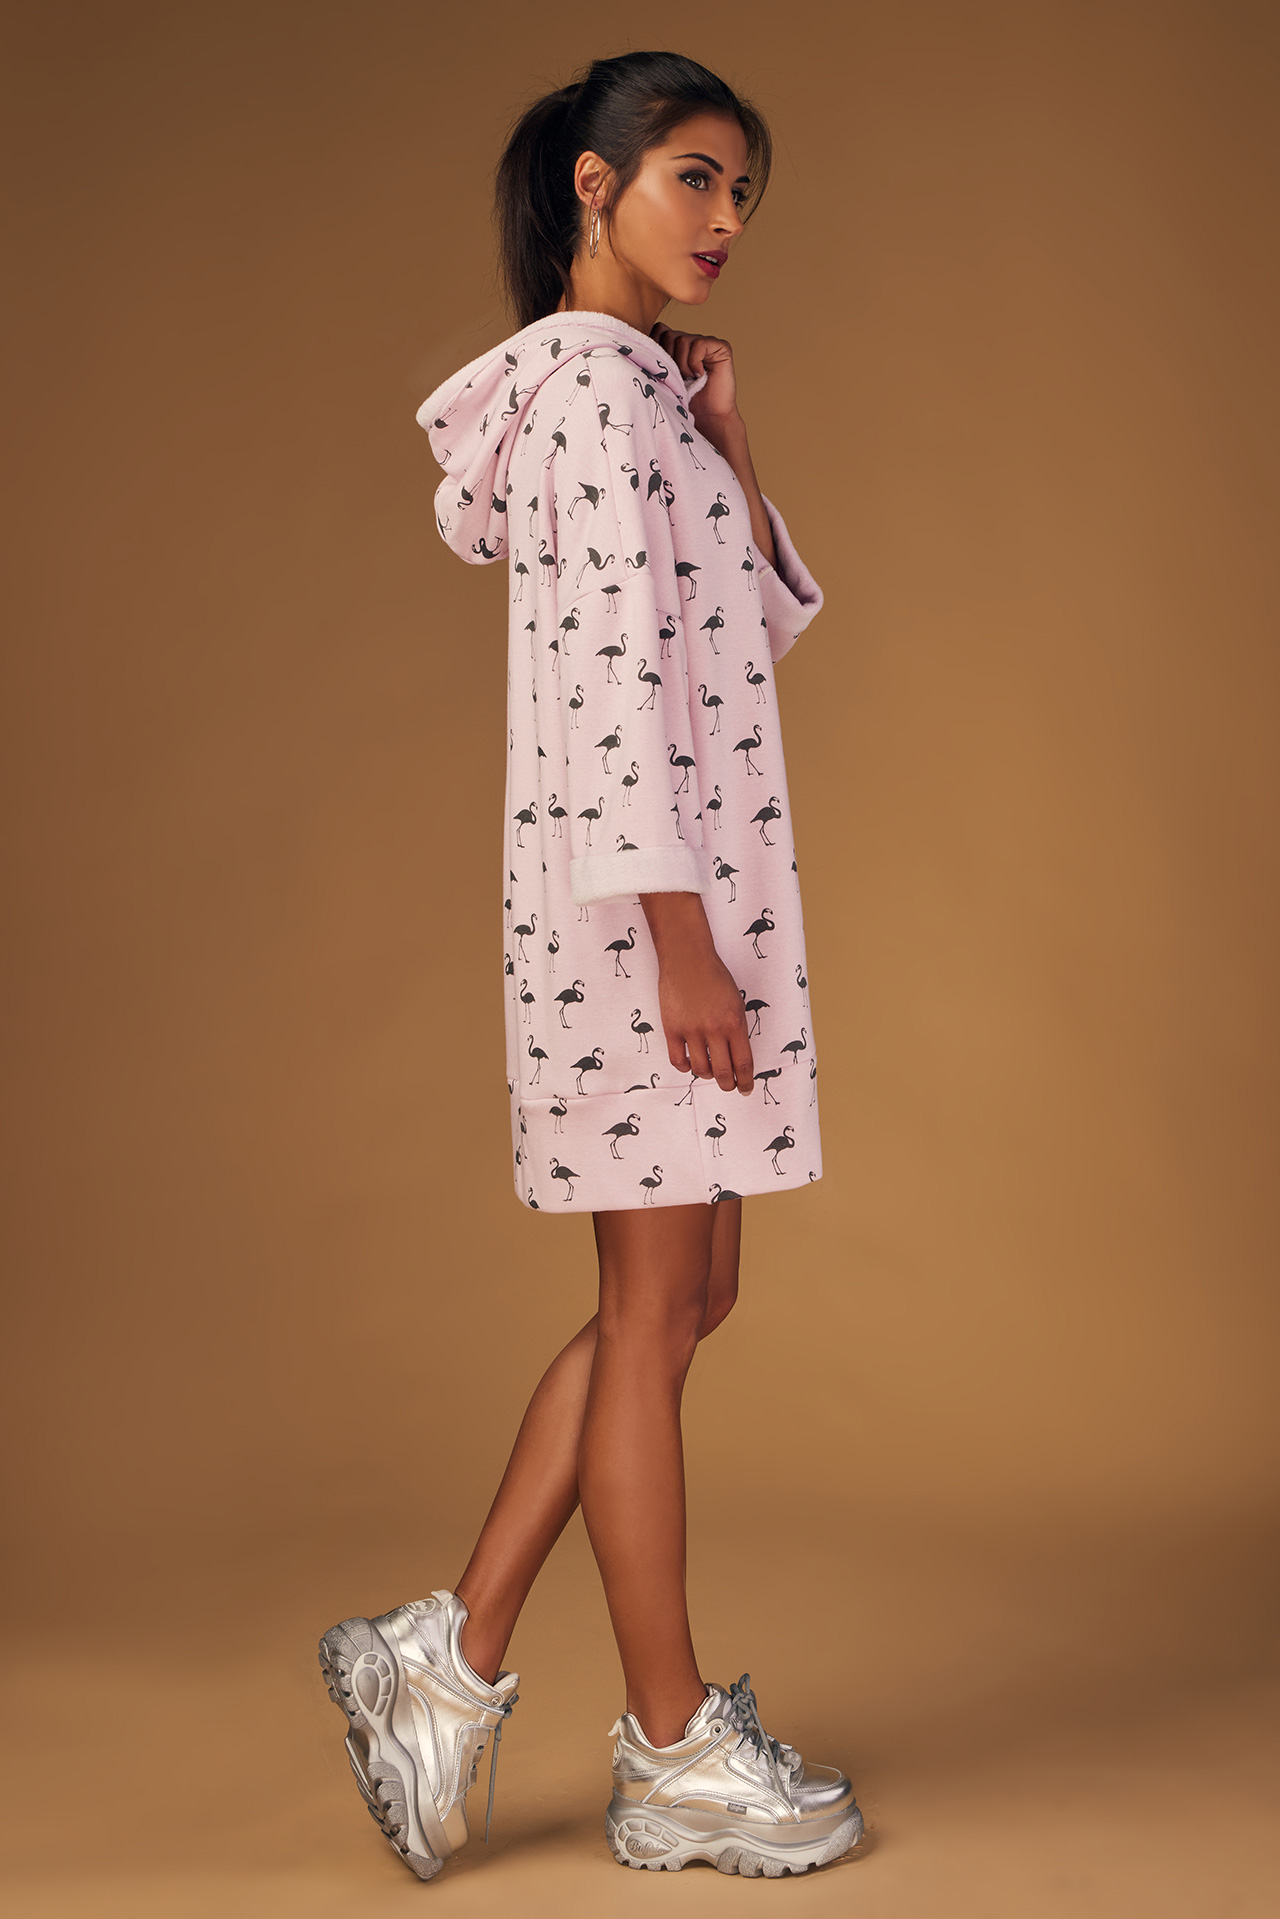 Robe Sweat Capuche Imprime Rose (vue profil)